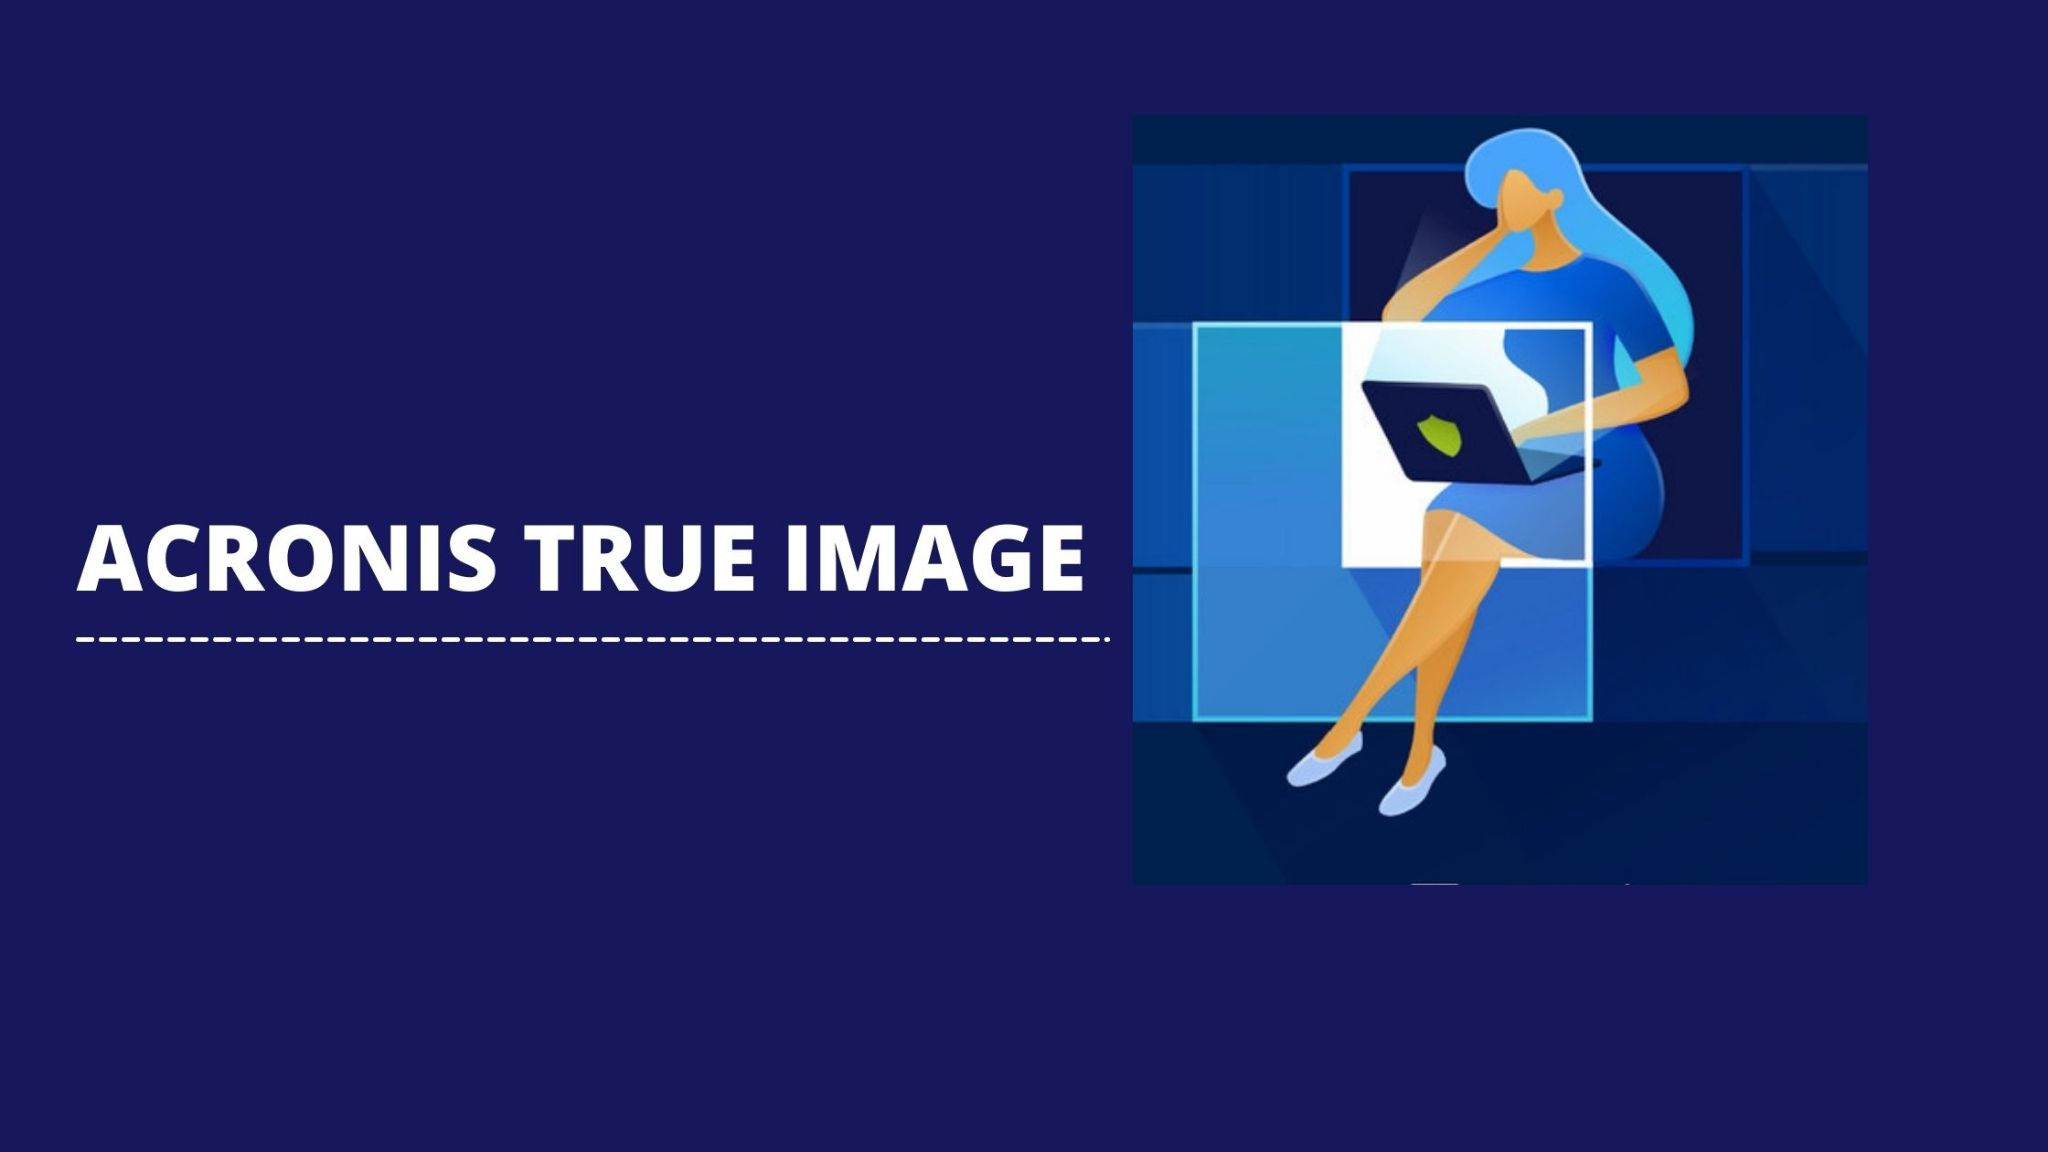 Acronis True Image - Backup software